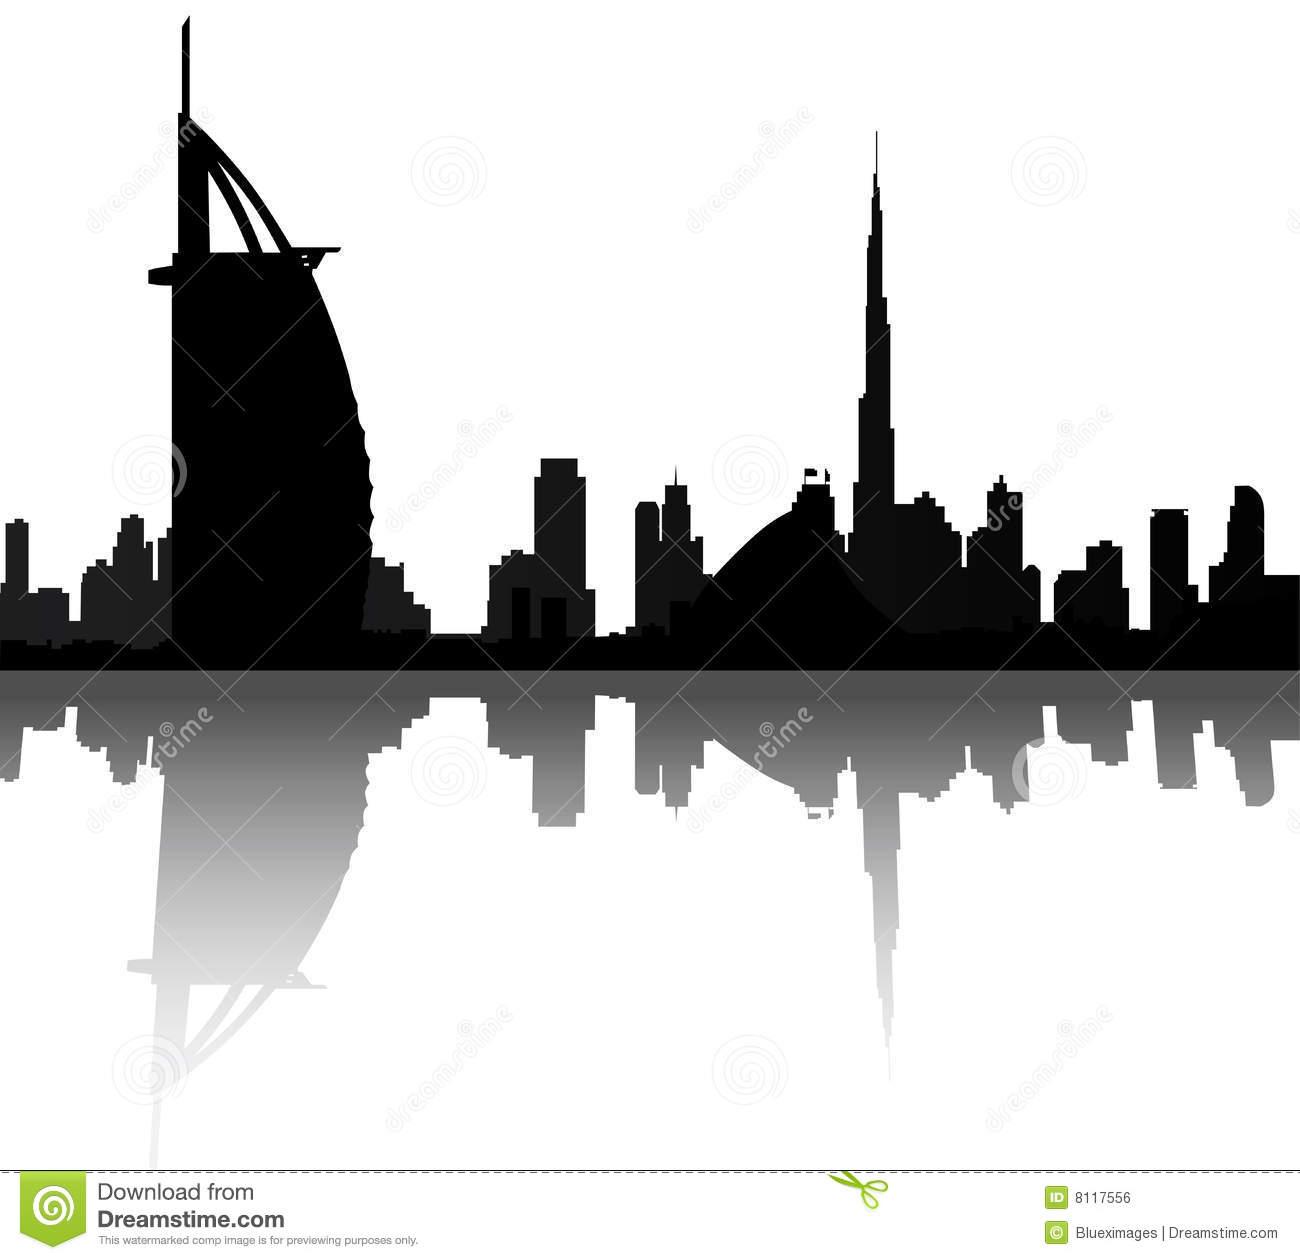 Dubai clipart 7 » Clipart Station.